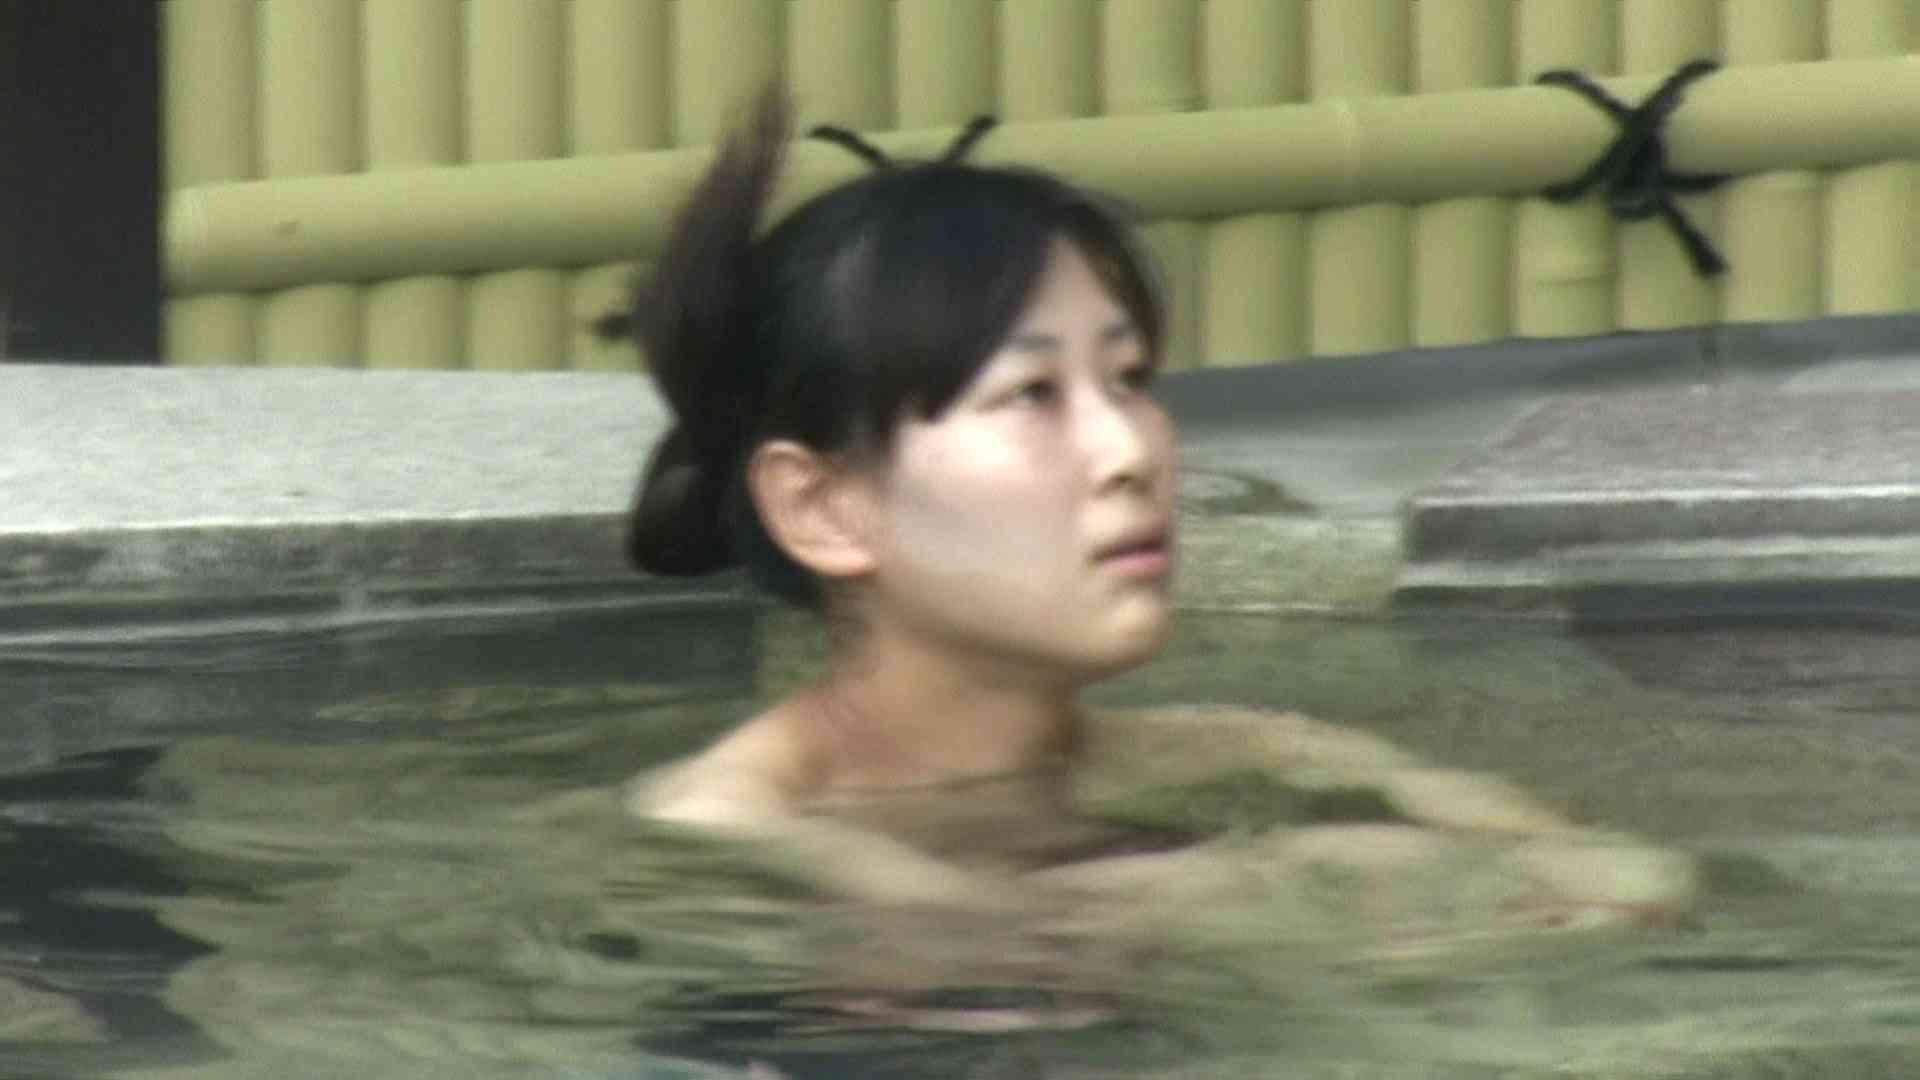 Aquaな露天風呂Vol.665 HなOL   盗撮  104pic 31